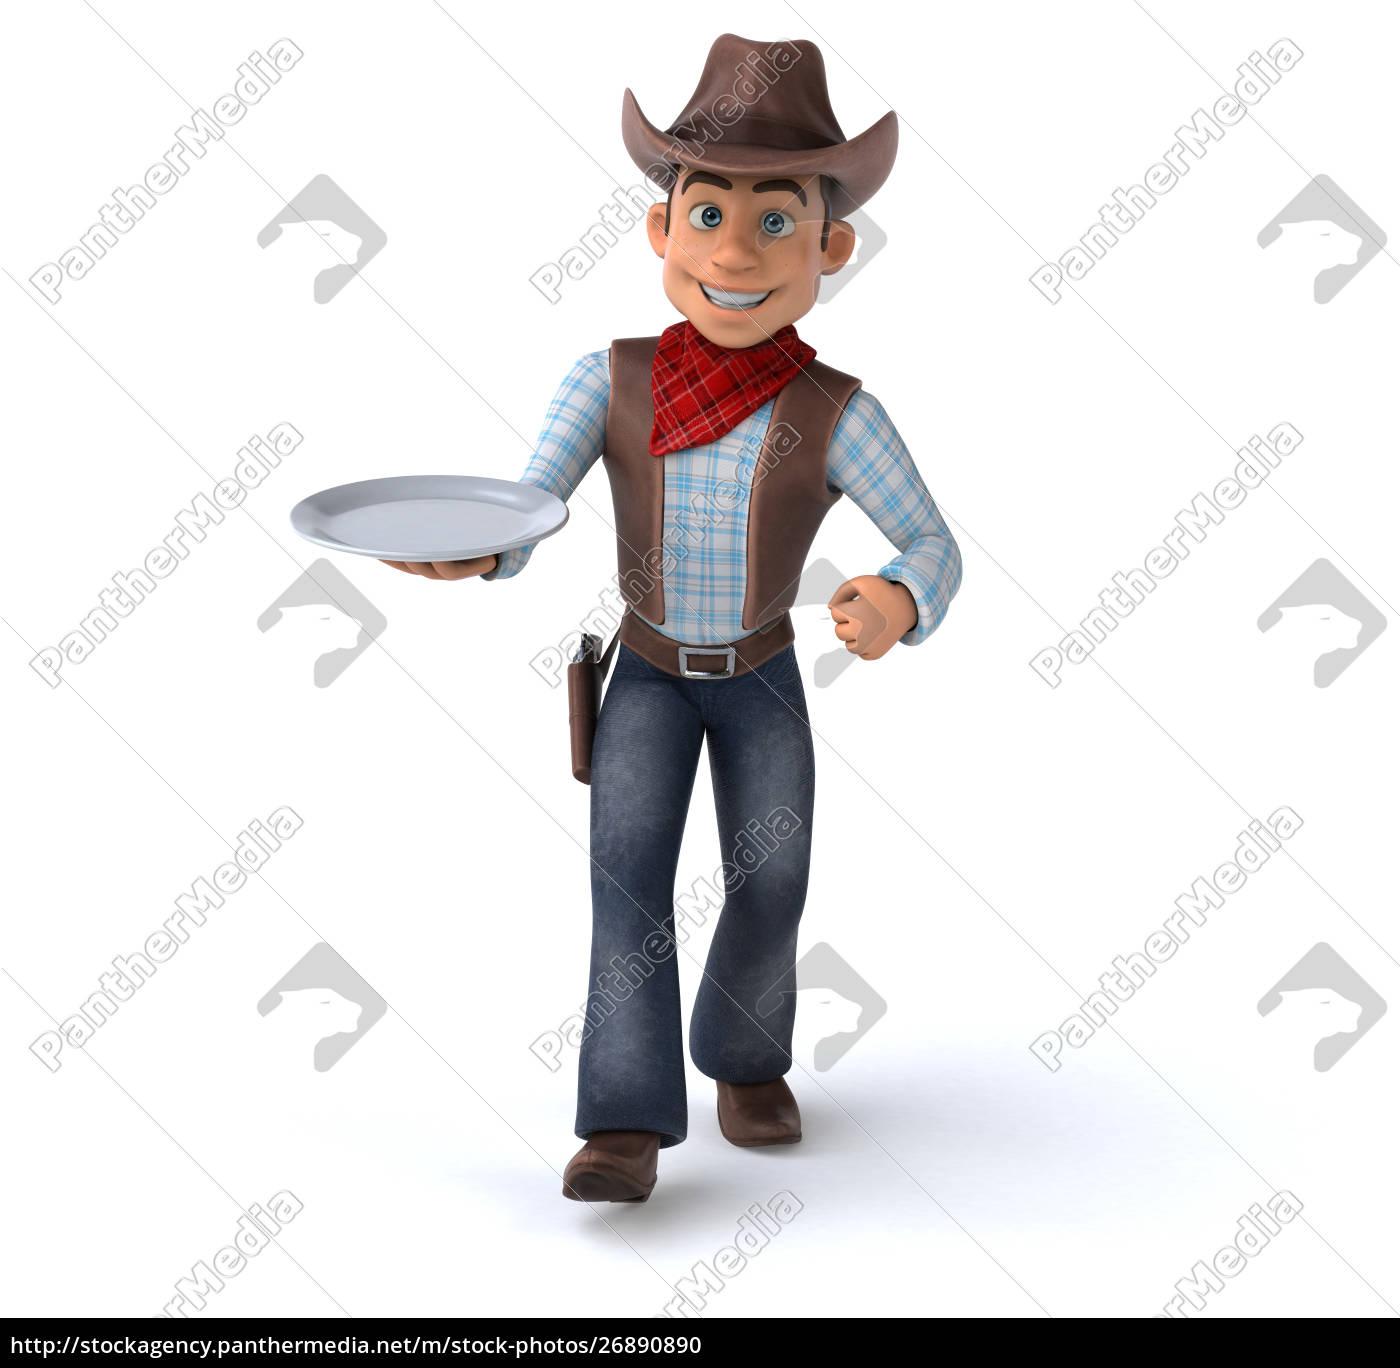 fun, cowboy, -, 3d, illustration - 26890890